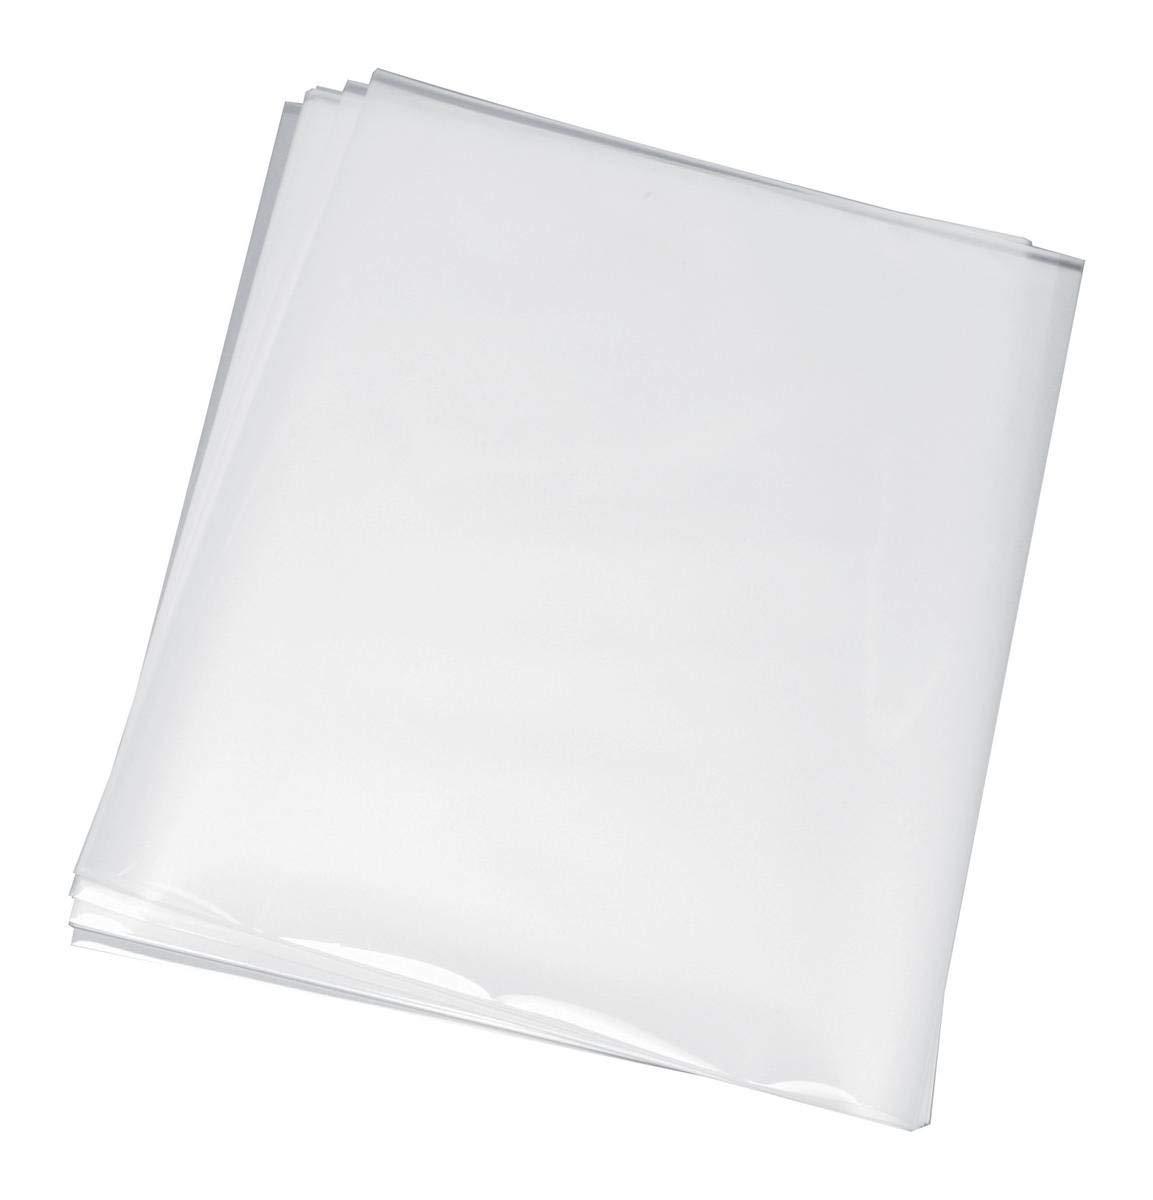 5 Star - Bolsas para plastificar (A3, 250 micras, 2 x 125 ...